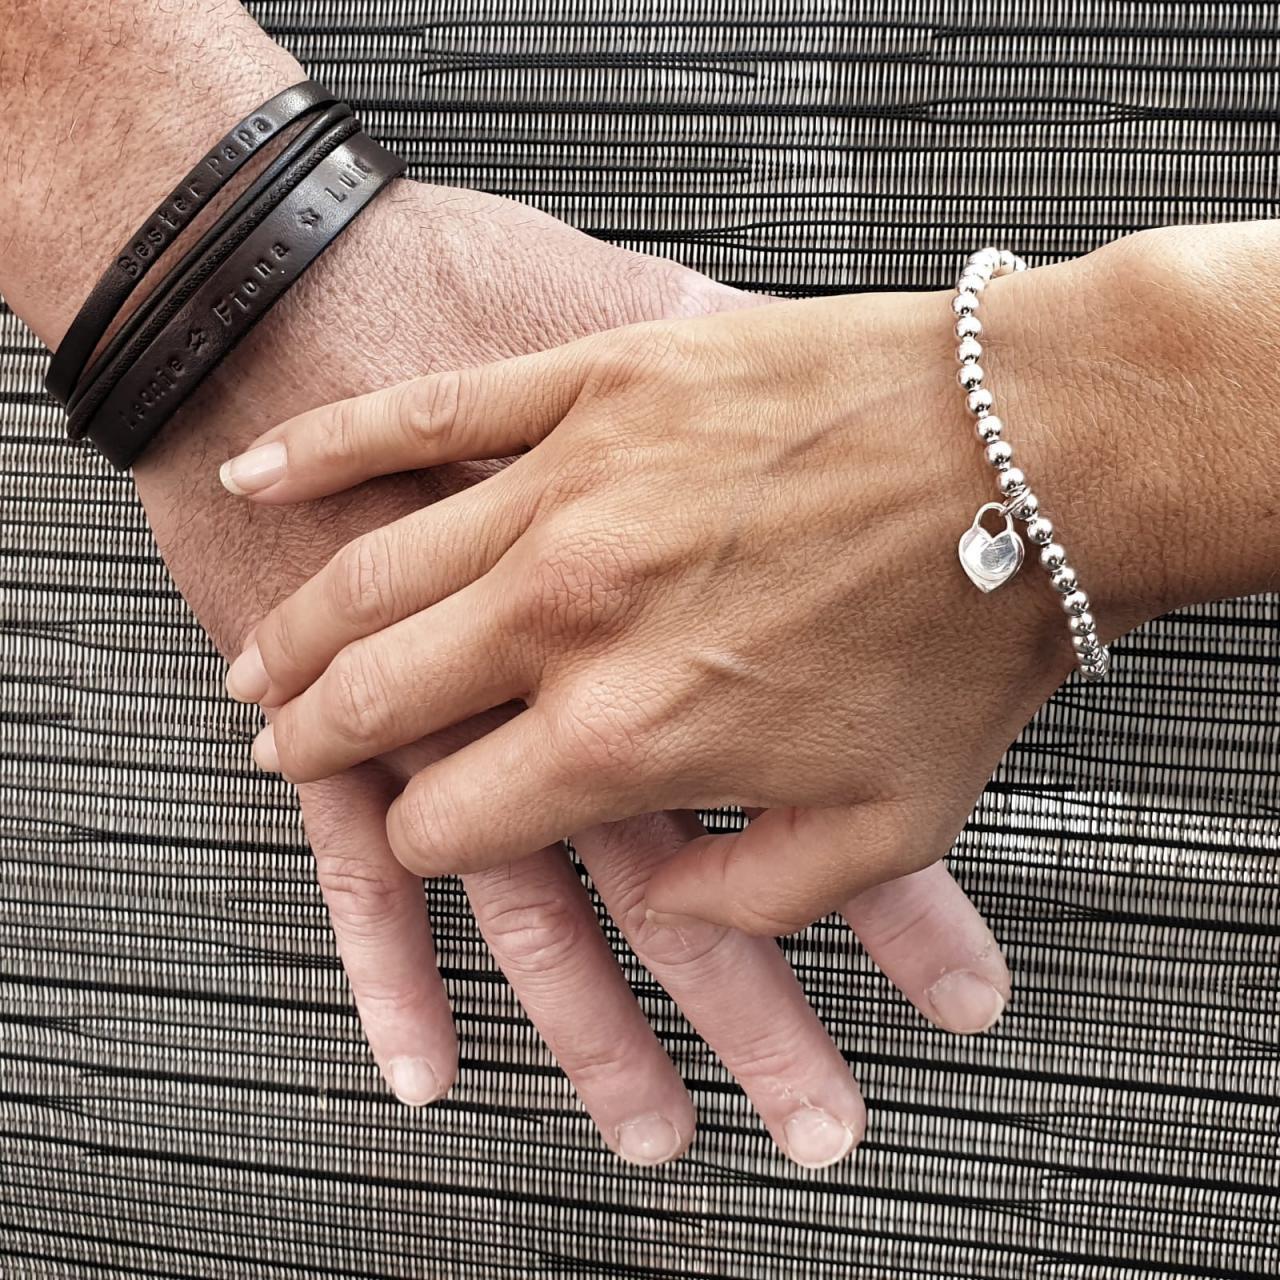 Schmuckset mit Wunschtext Gravur Geschenkidee Herrenarmband Leder Silber Herz